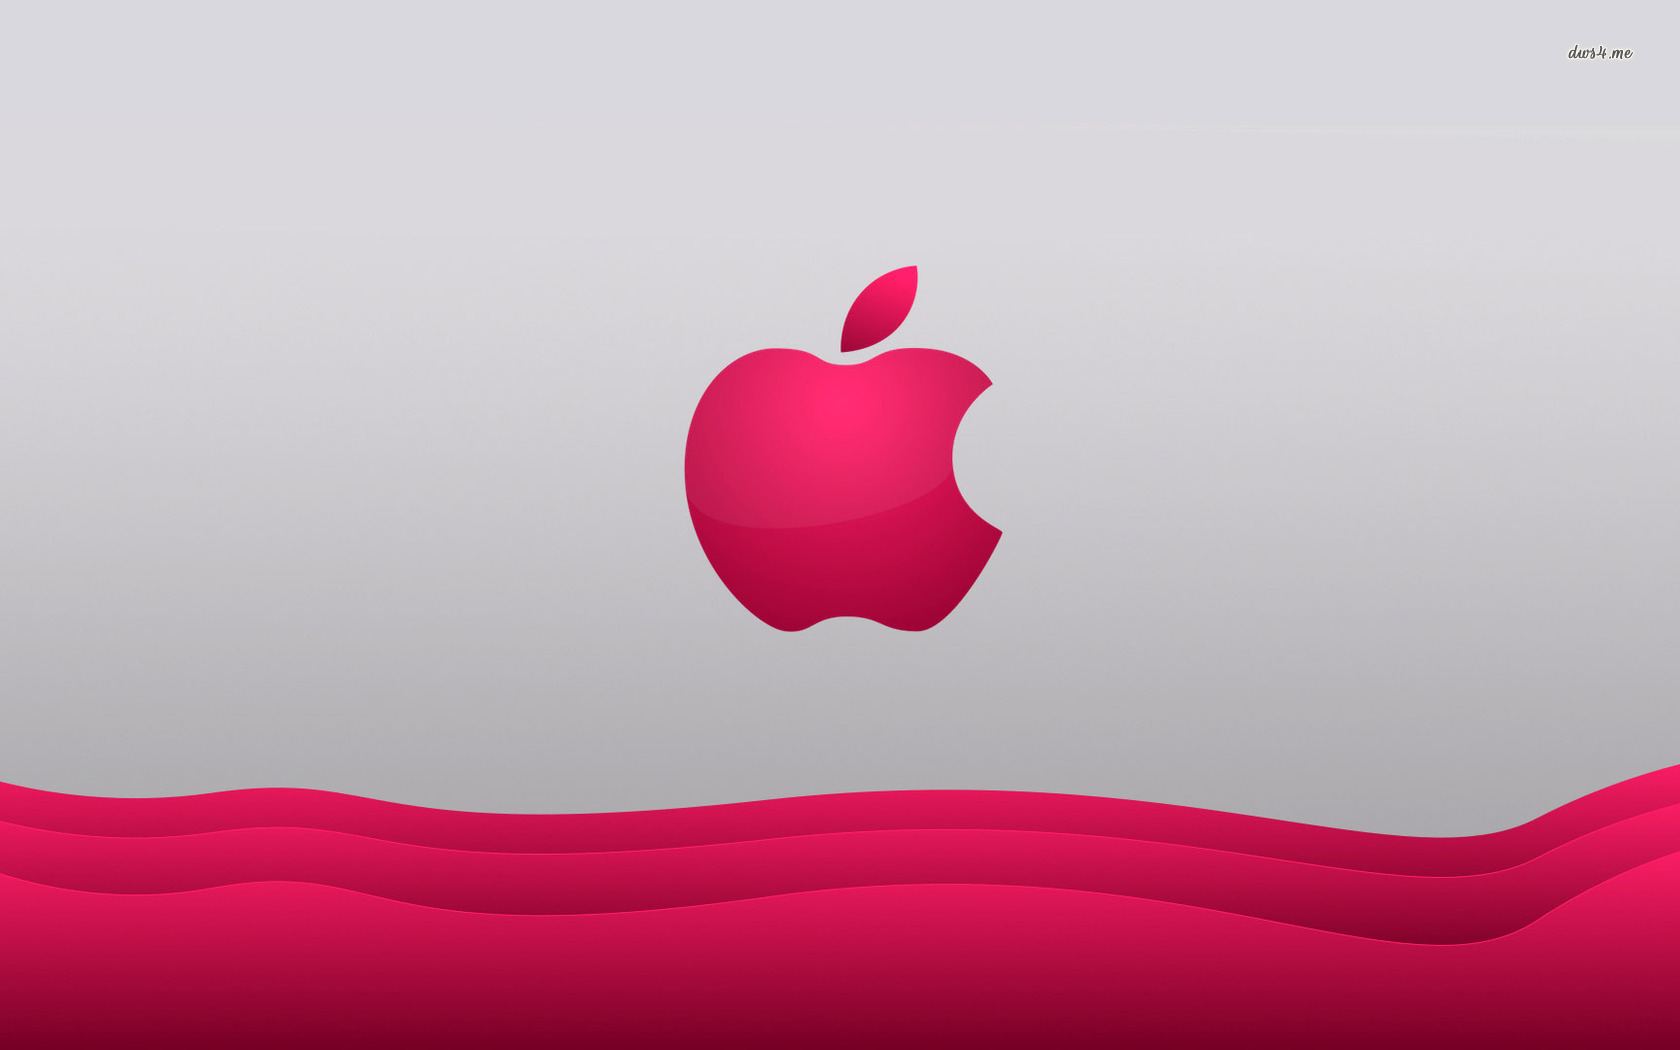 Hot Pink Apple Wallpaper Hot pink apple 1680x1050